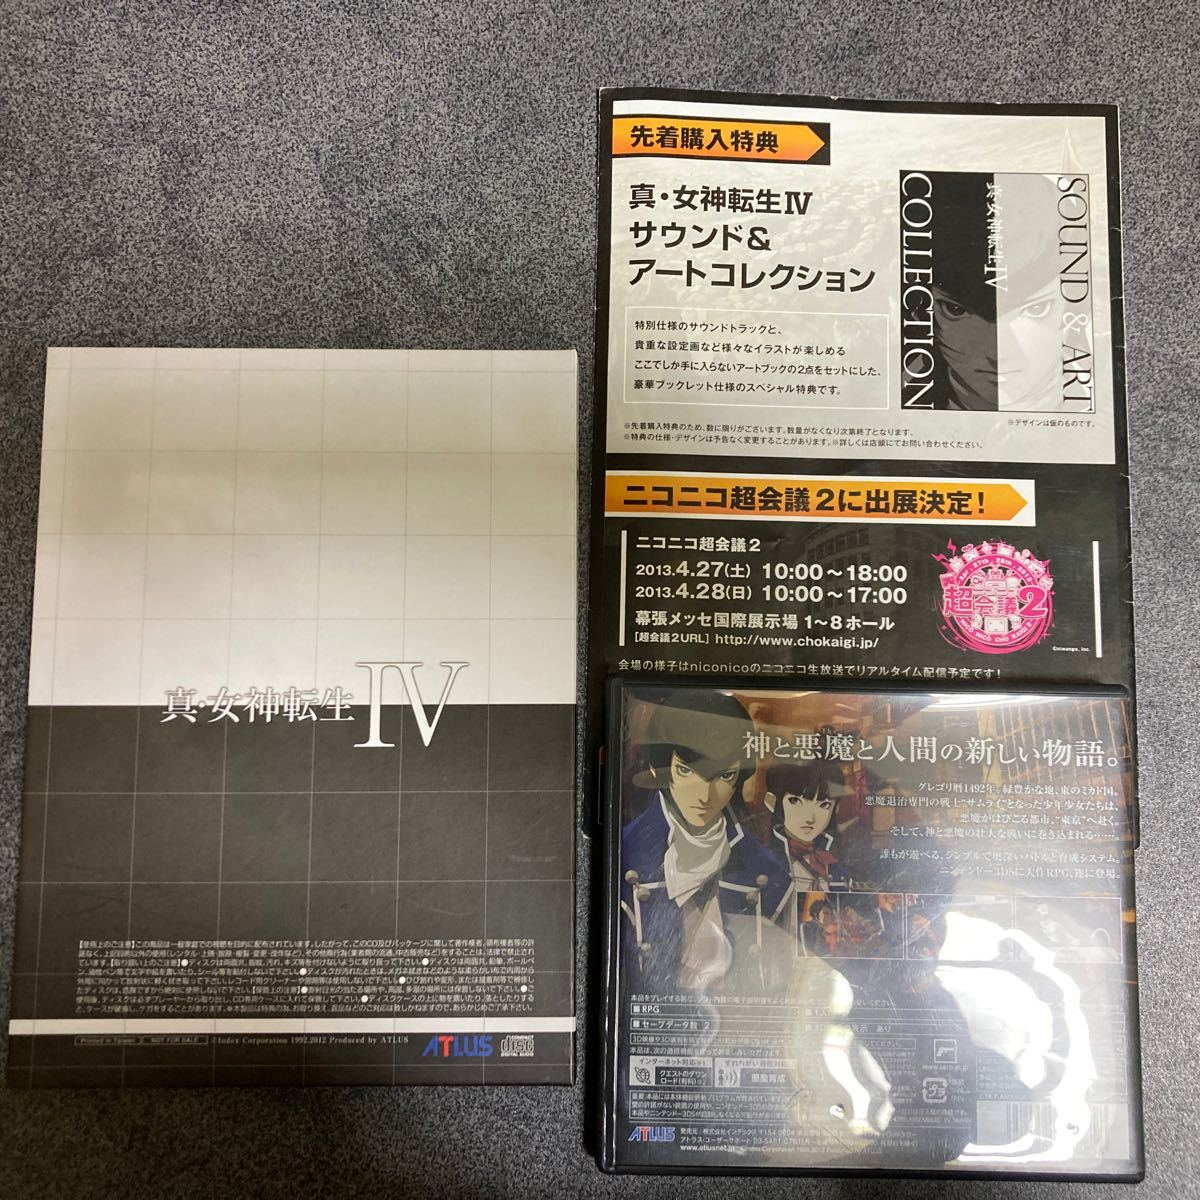 【3DS】 真・女神転生IV 先着購入特典「サウンド&アートコレクション、店頭配布チラシ付き